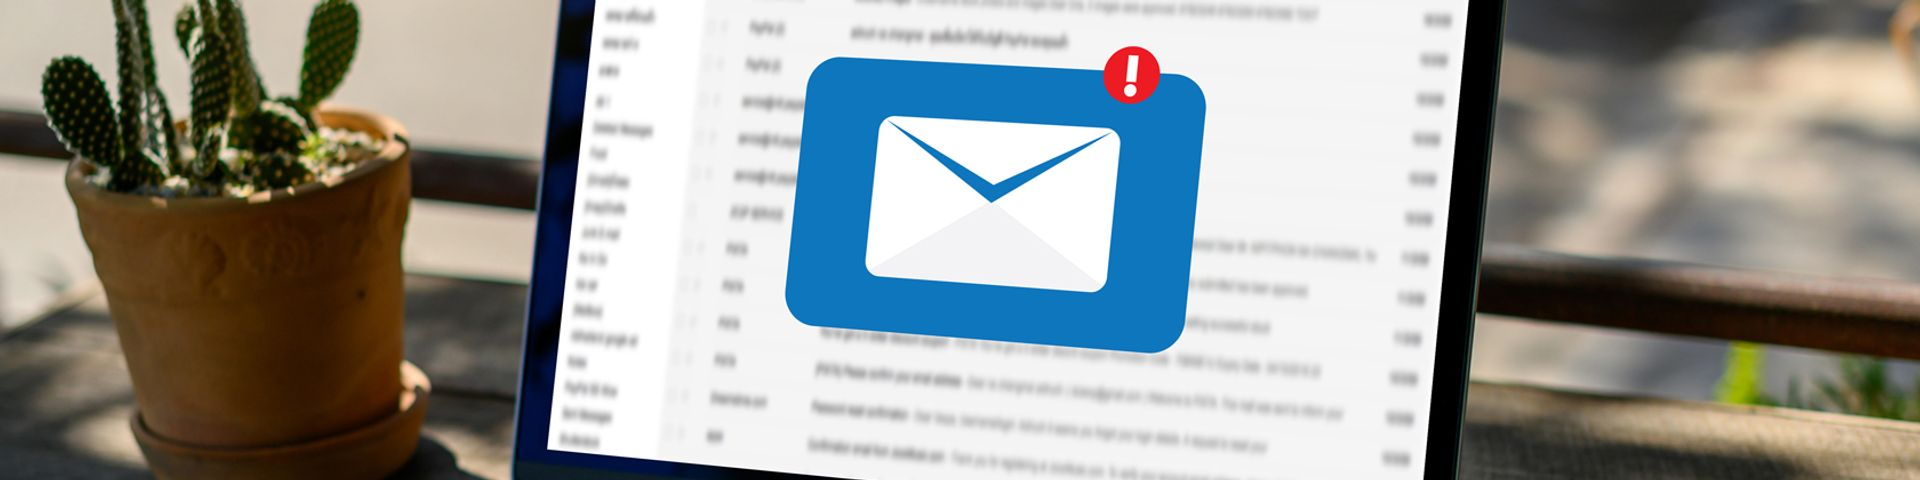 Captación de clientes a través de email marketing, uso de mailchimp